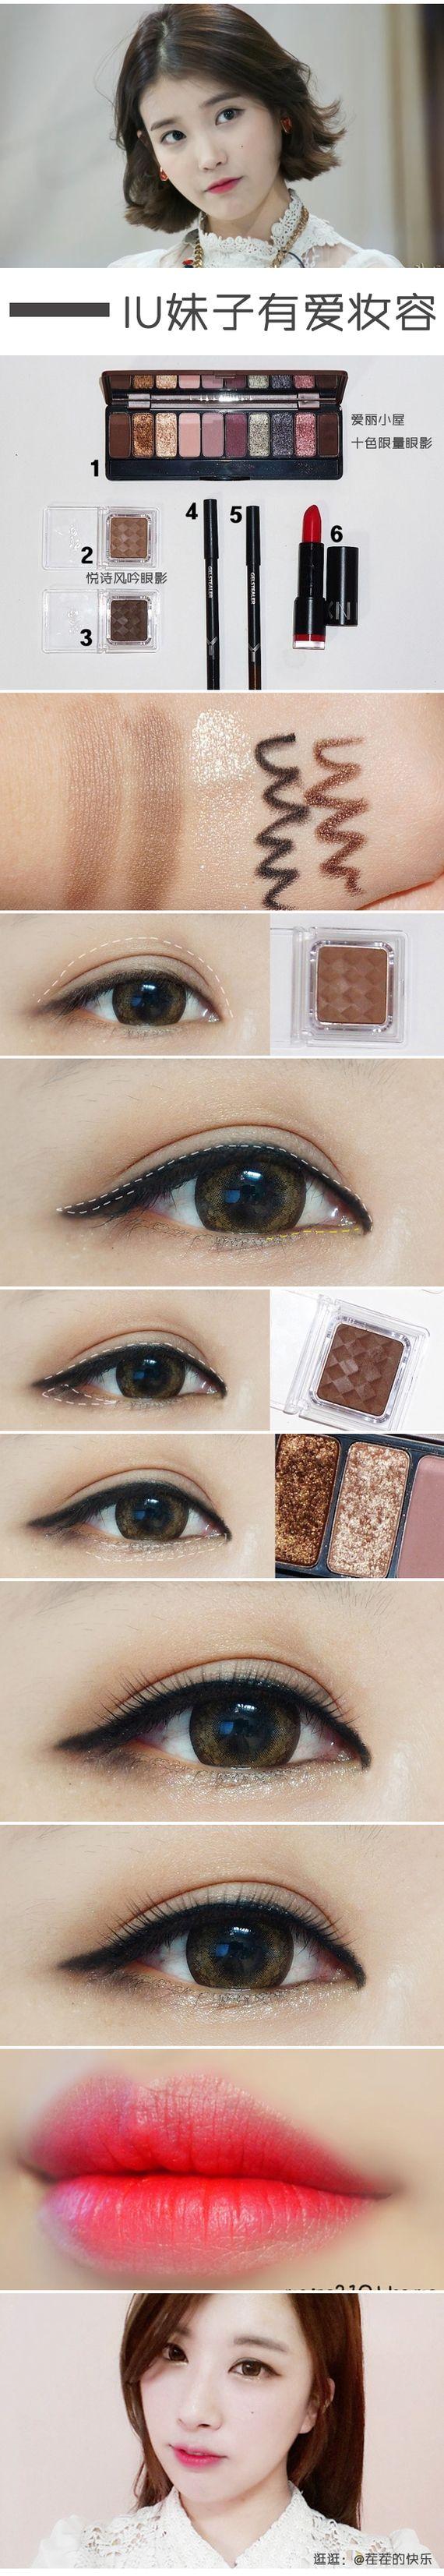 // IU k-pop korean makeup tutorial http://nerium.kr/preenroll/debbiekrug?alias=debbiekrug | www.AsianSkincare.Rocks